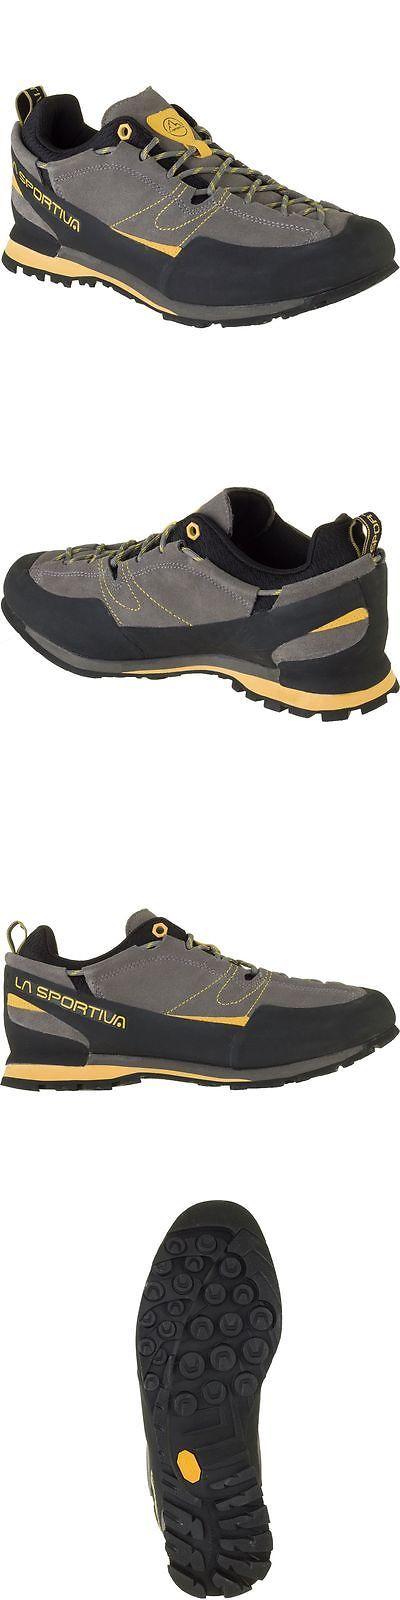 Men 158978: La Sportiva Boulder X Approach Shoe - Mens Grey/Yellow 43.0 BUY IT NOW ONLY: $110.0